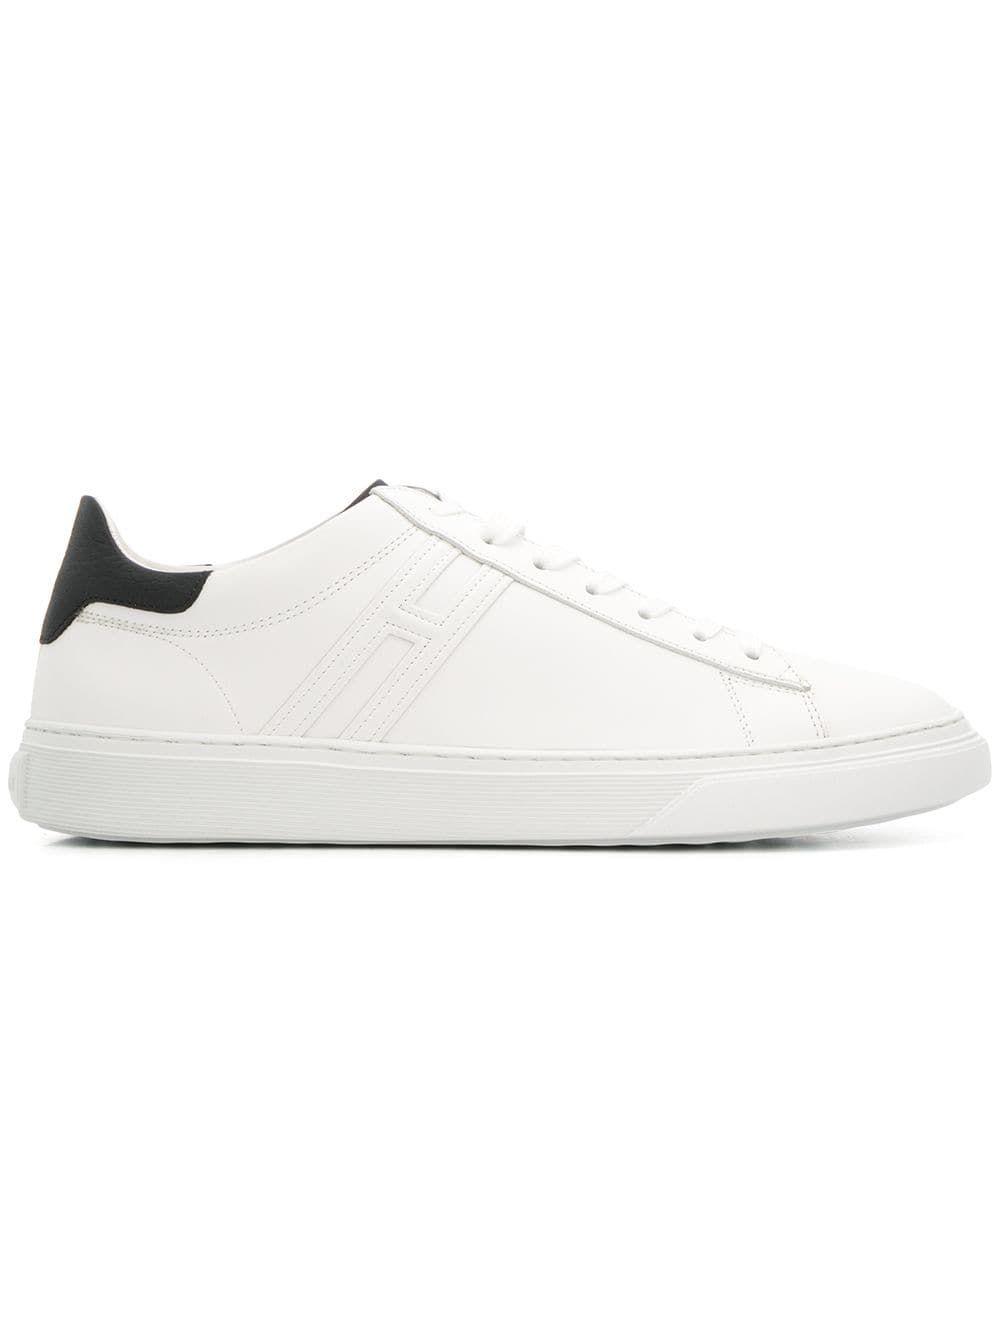 Hogan Sneakers H365 Tal.nero Bianche In White | ModeSens ...